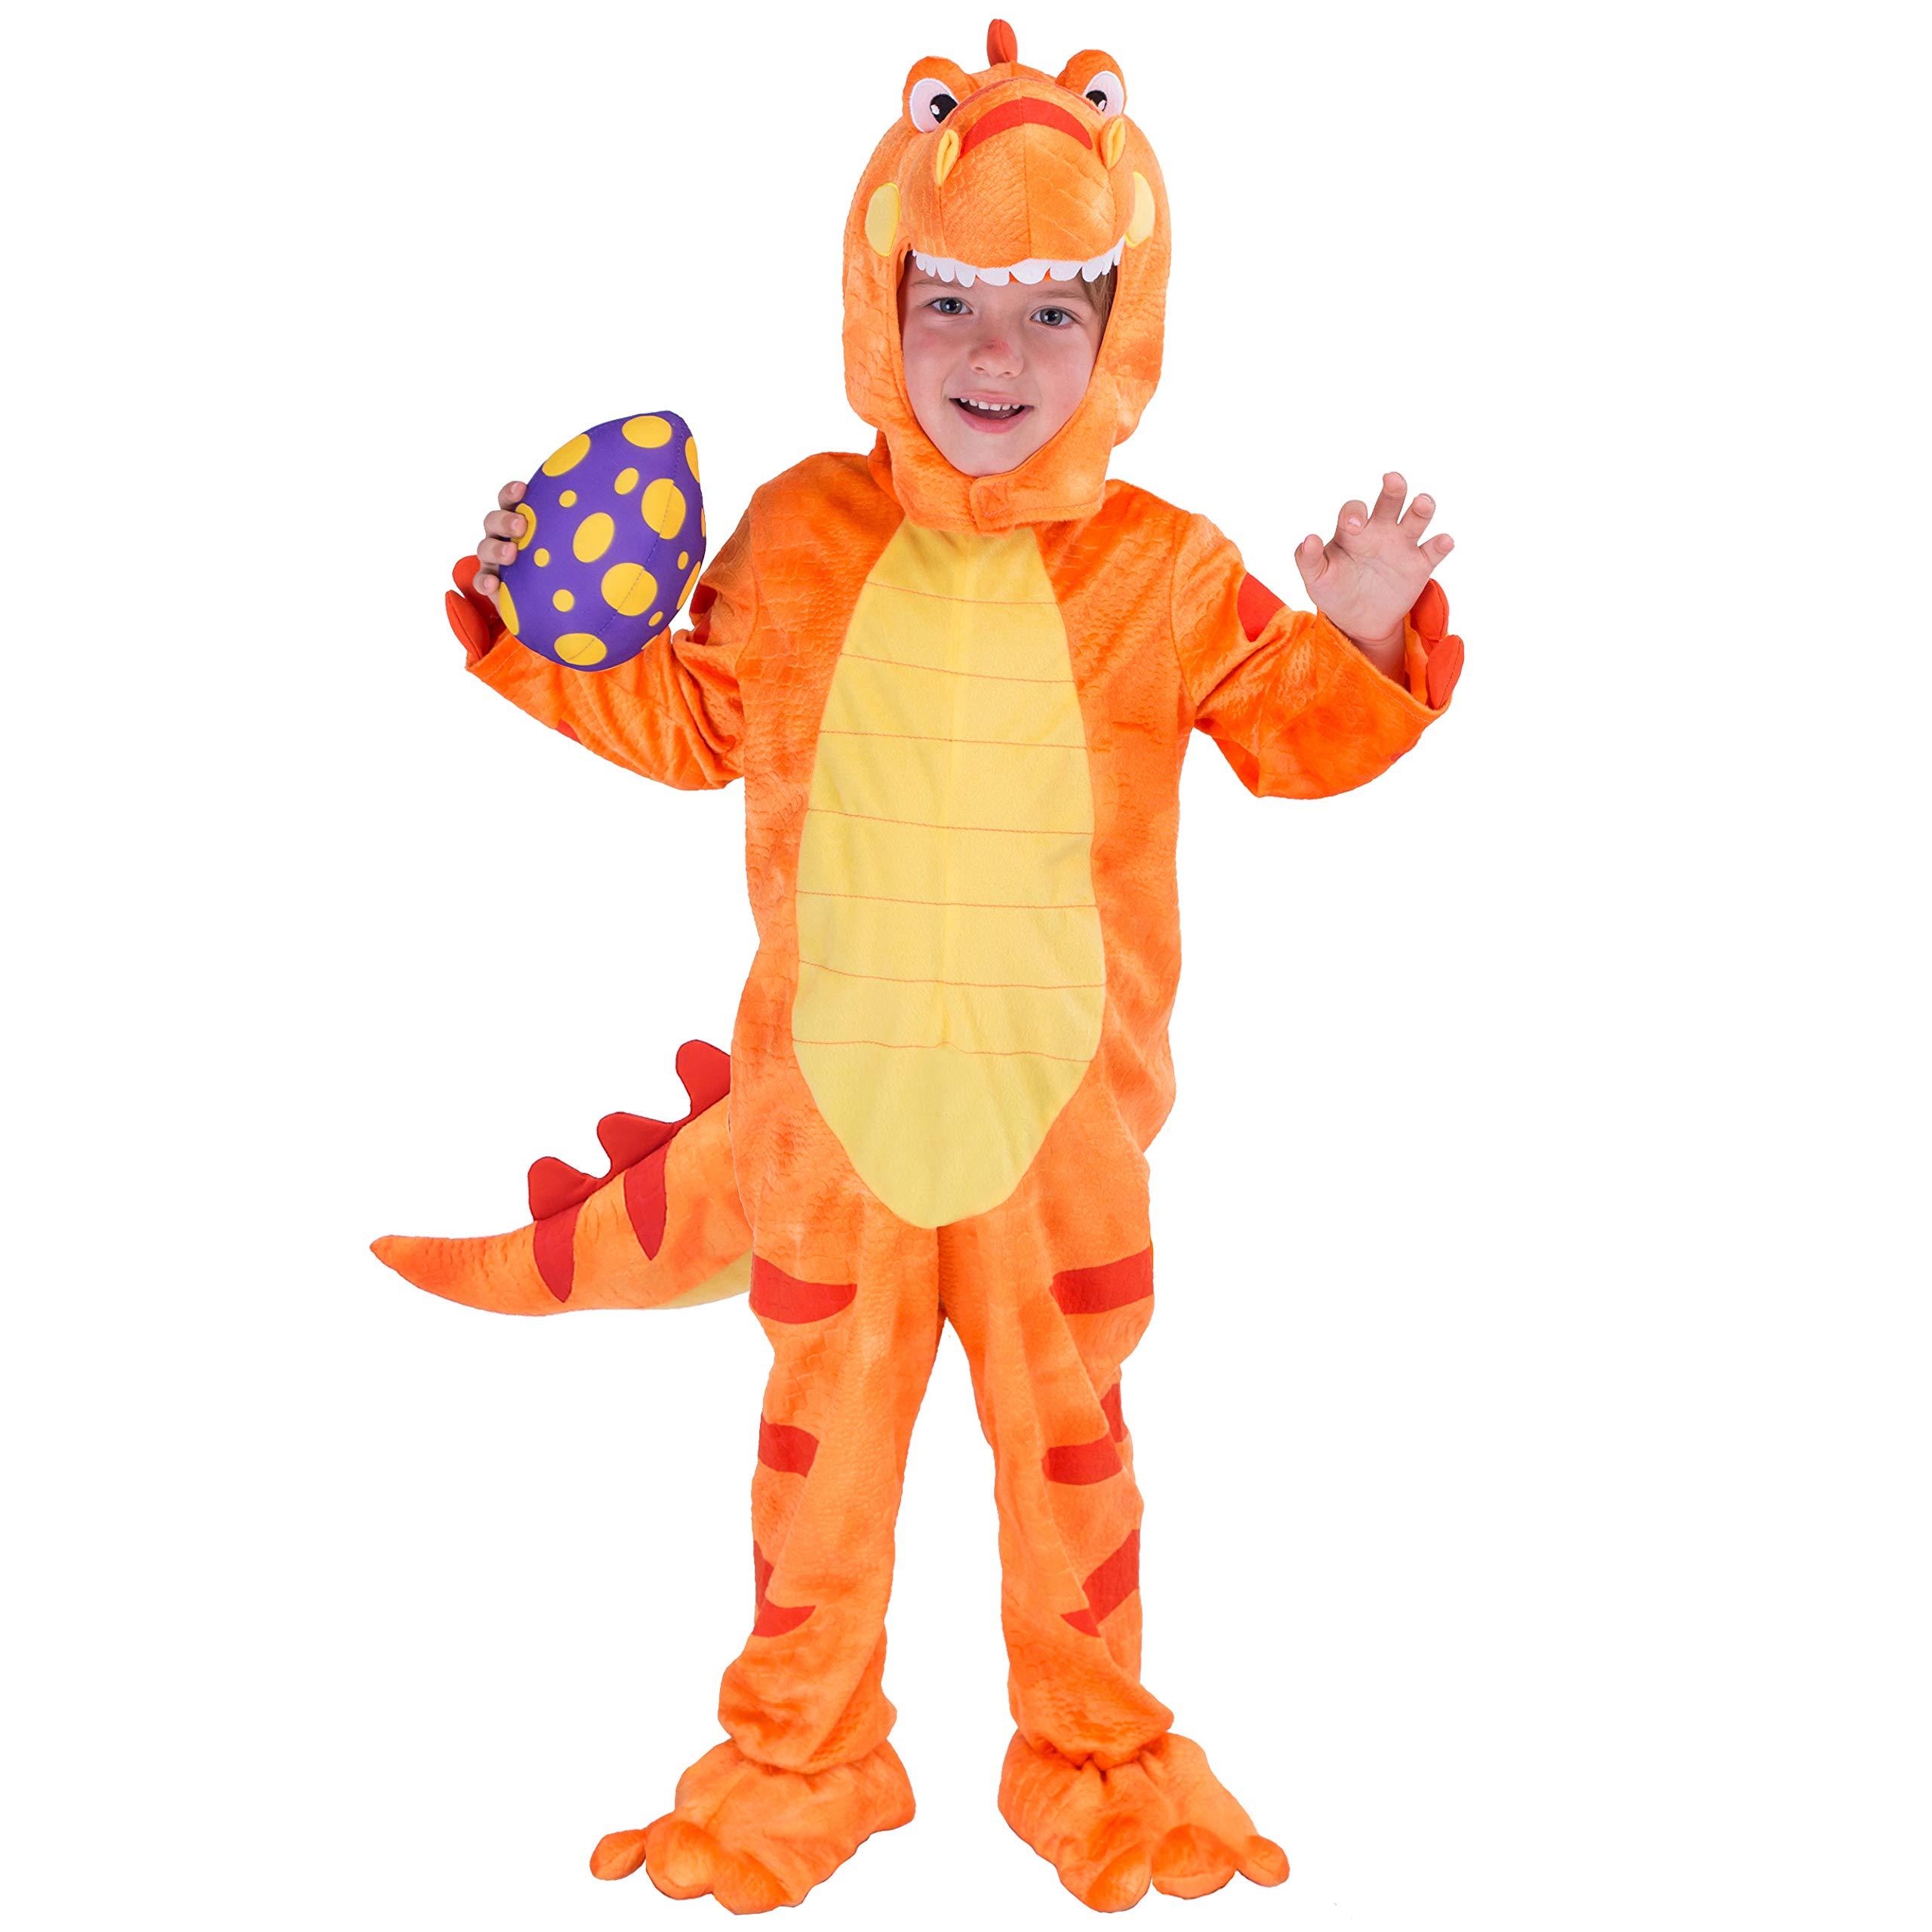 Spooktacular Creations Child T-Rex Costume (3T)